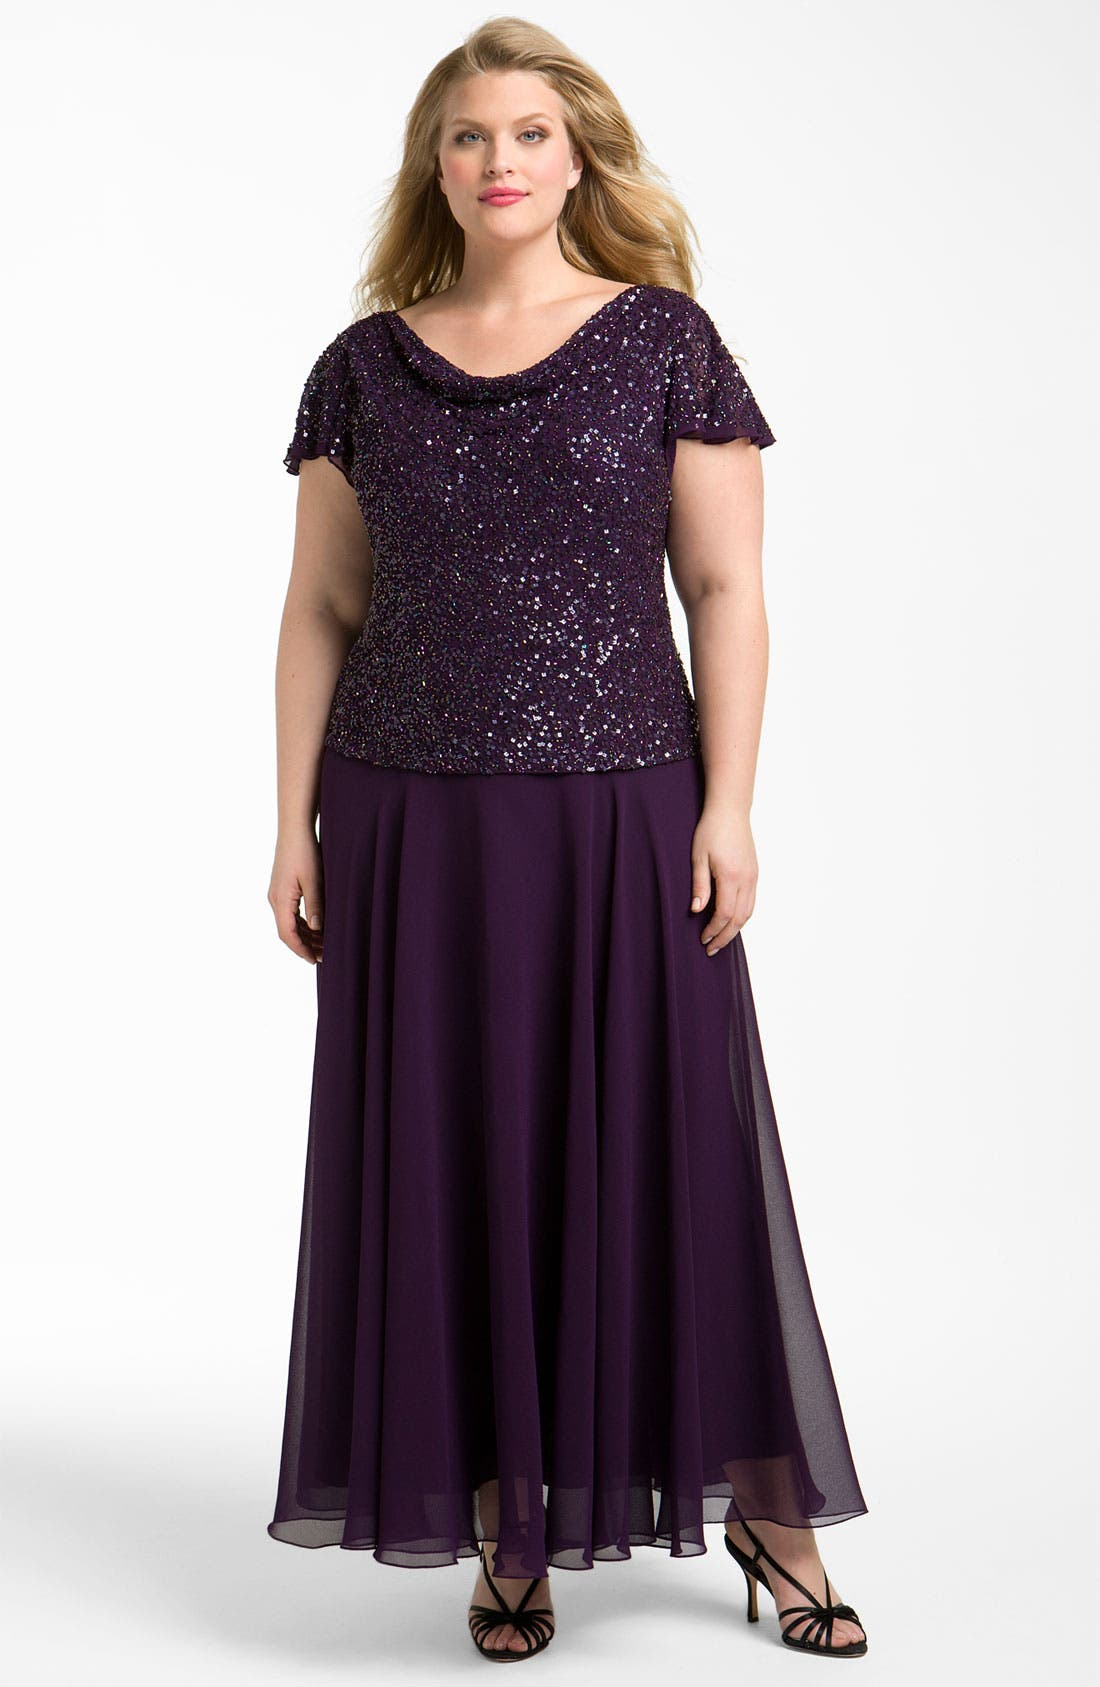 Alternate Image 1 Selected - J Kara Embellished Mock Two-Piece Dress (Plus Size)